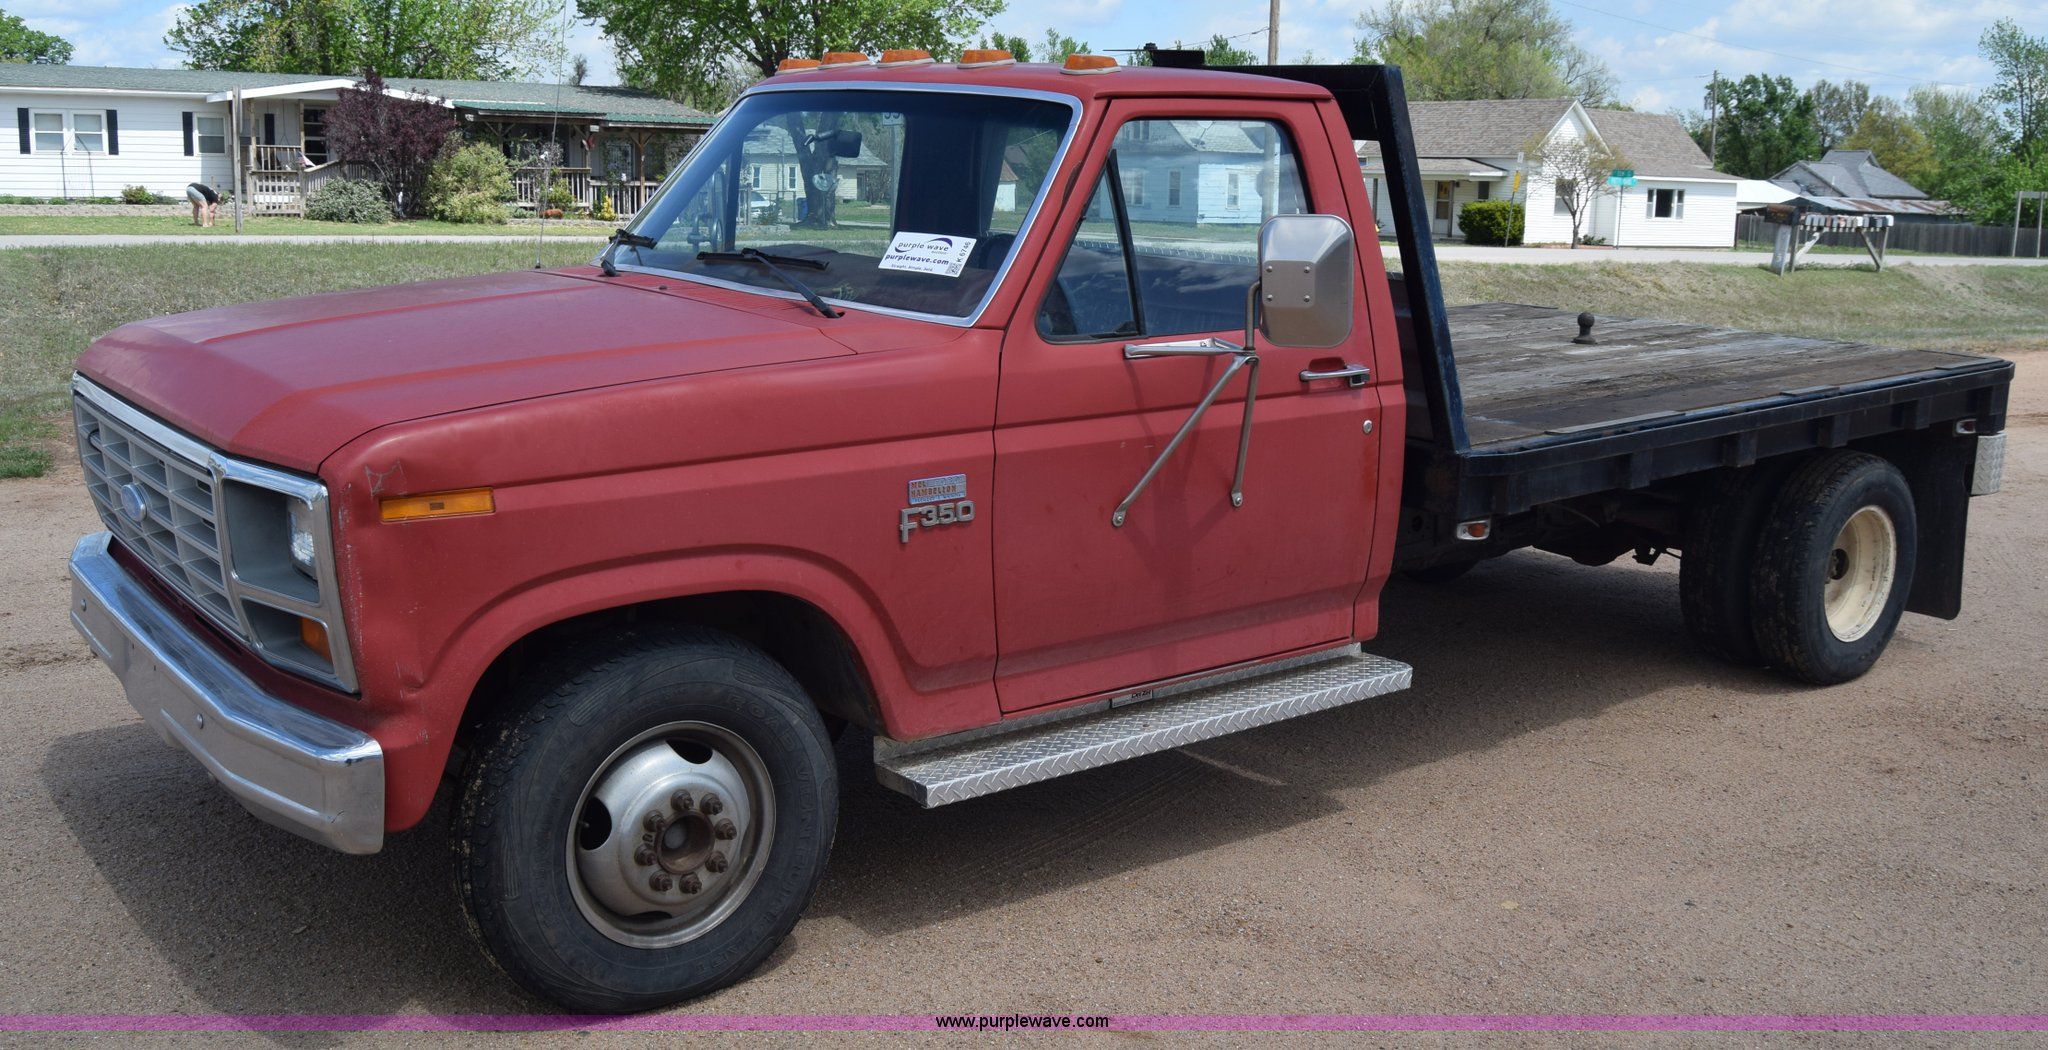 1985 Ford F350 flatbed pickup truck Item K6746